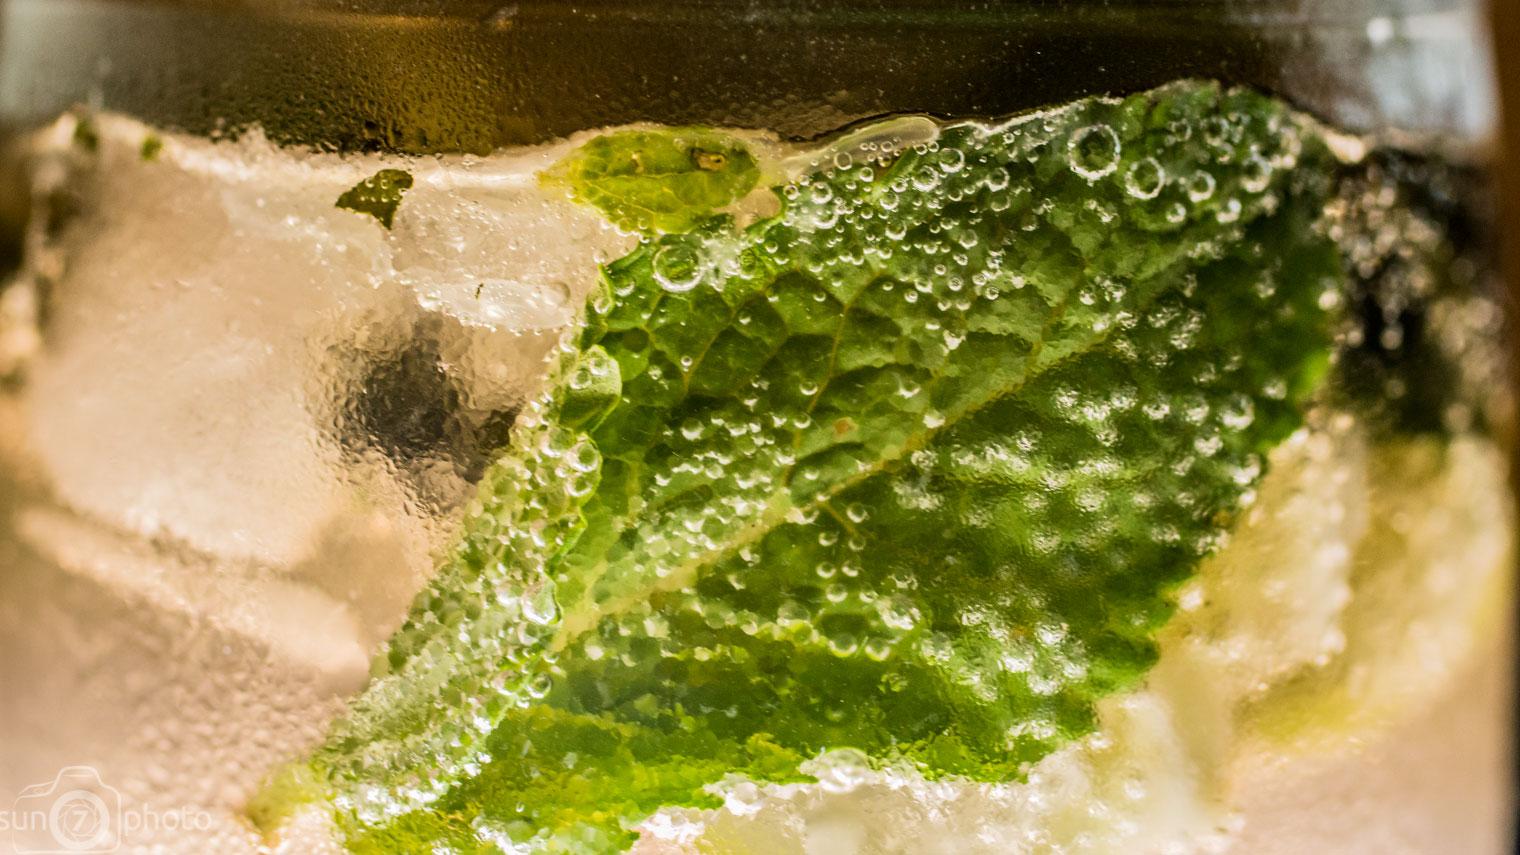 Fresh Mint Leaf & Sparkling Water